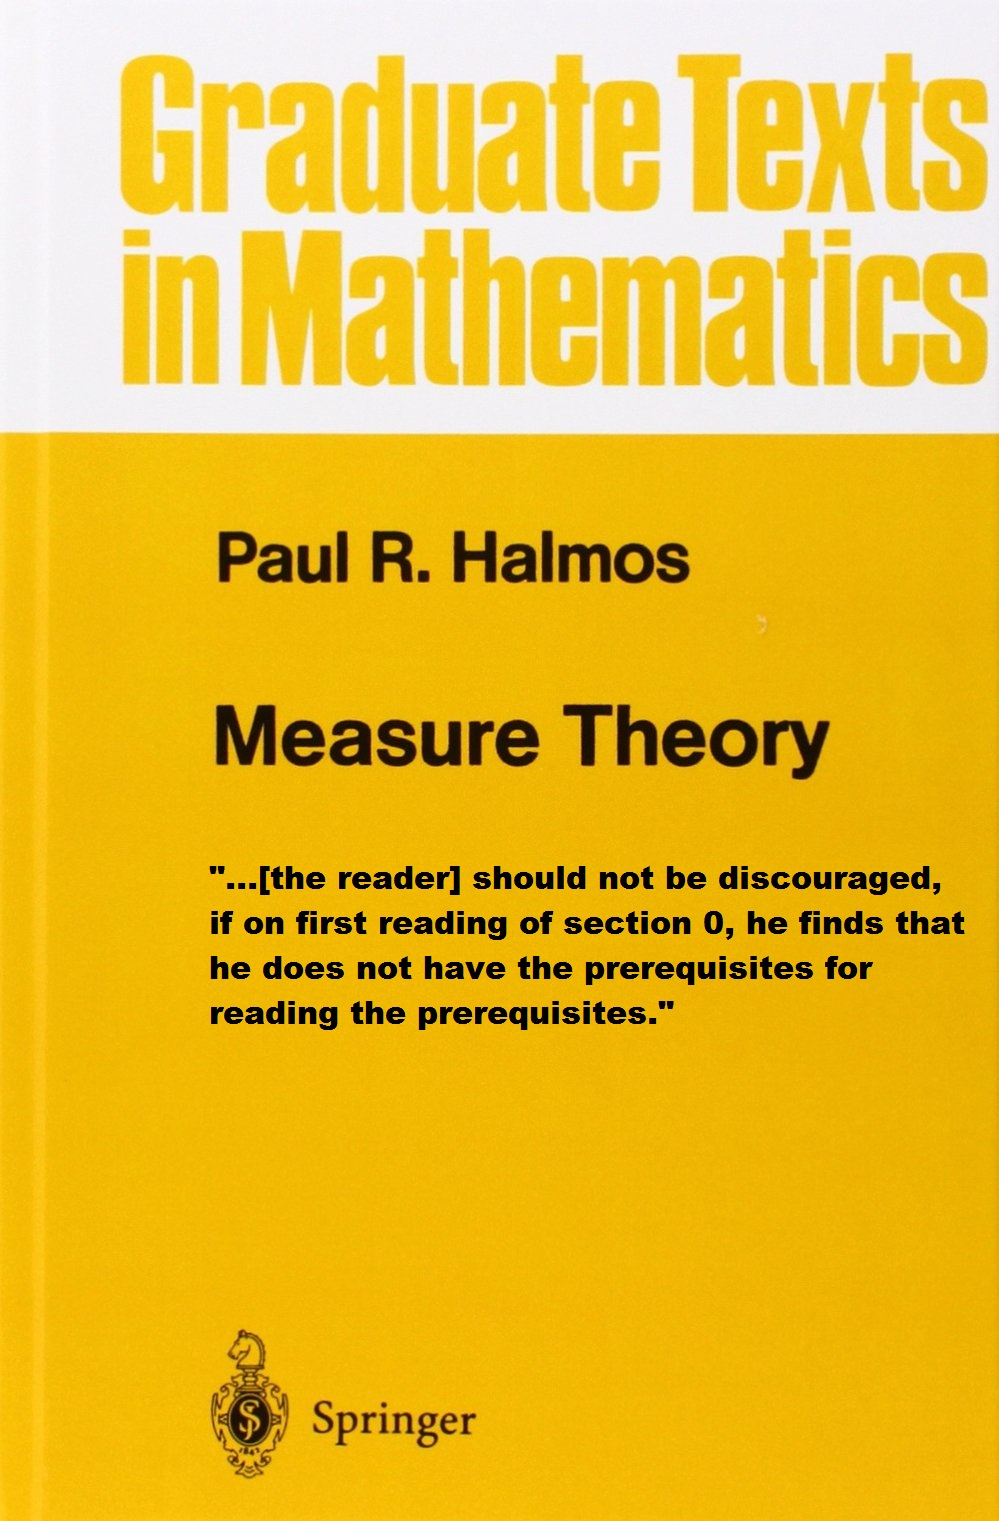 Paul Halmos on Prerequisites